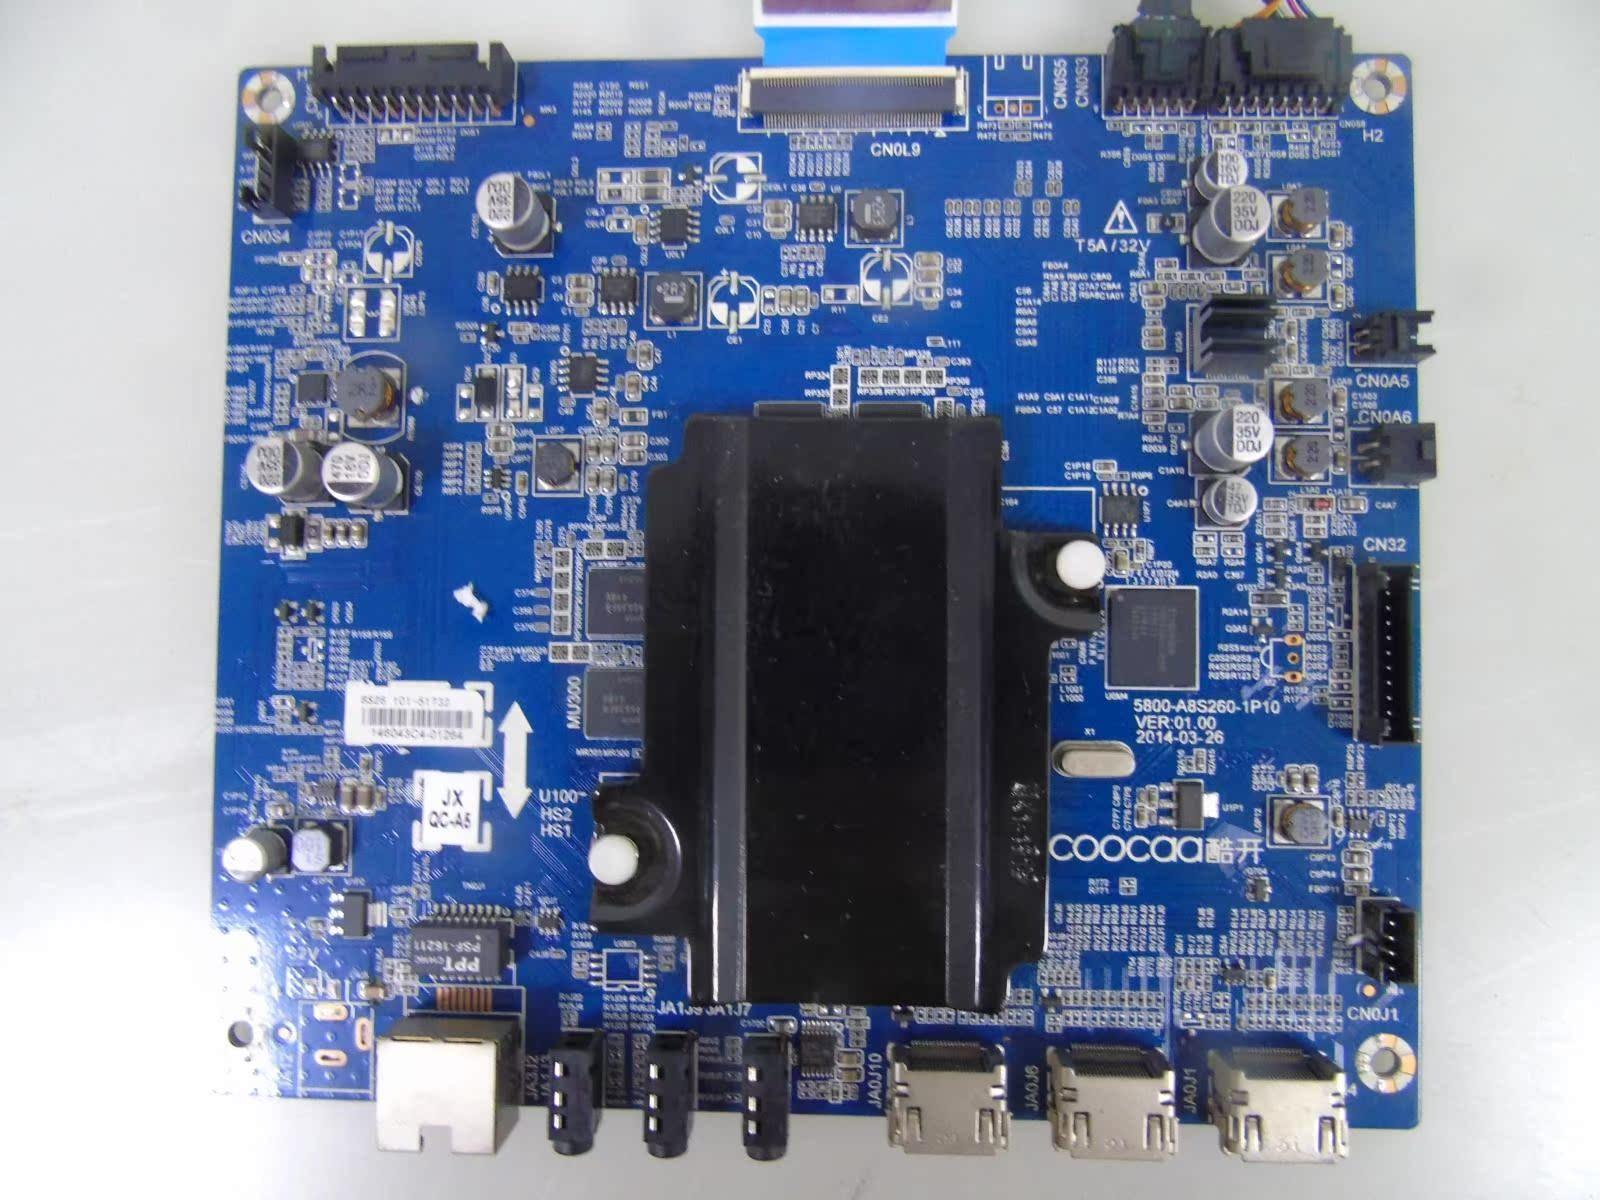 创维酷开 U49 主板 5800-A8S260-1P40 配 SEL490WY(LD0-410) 屏